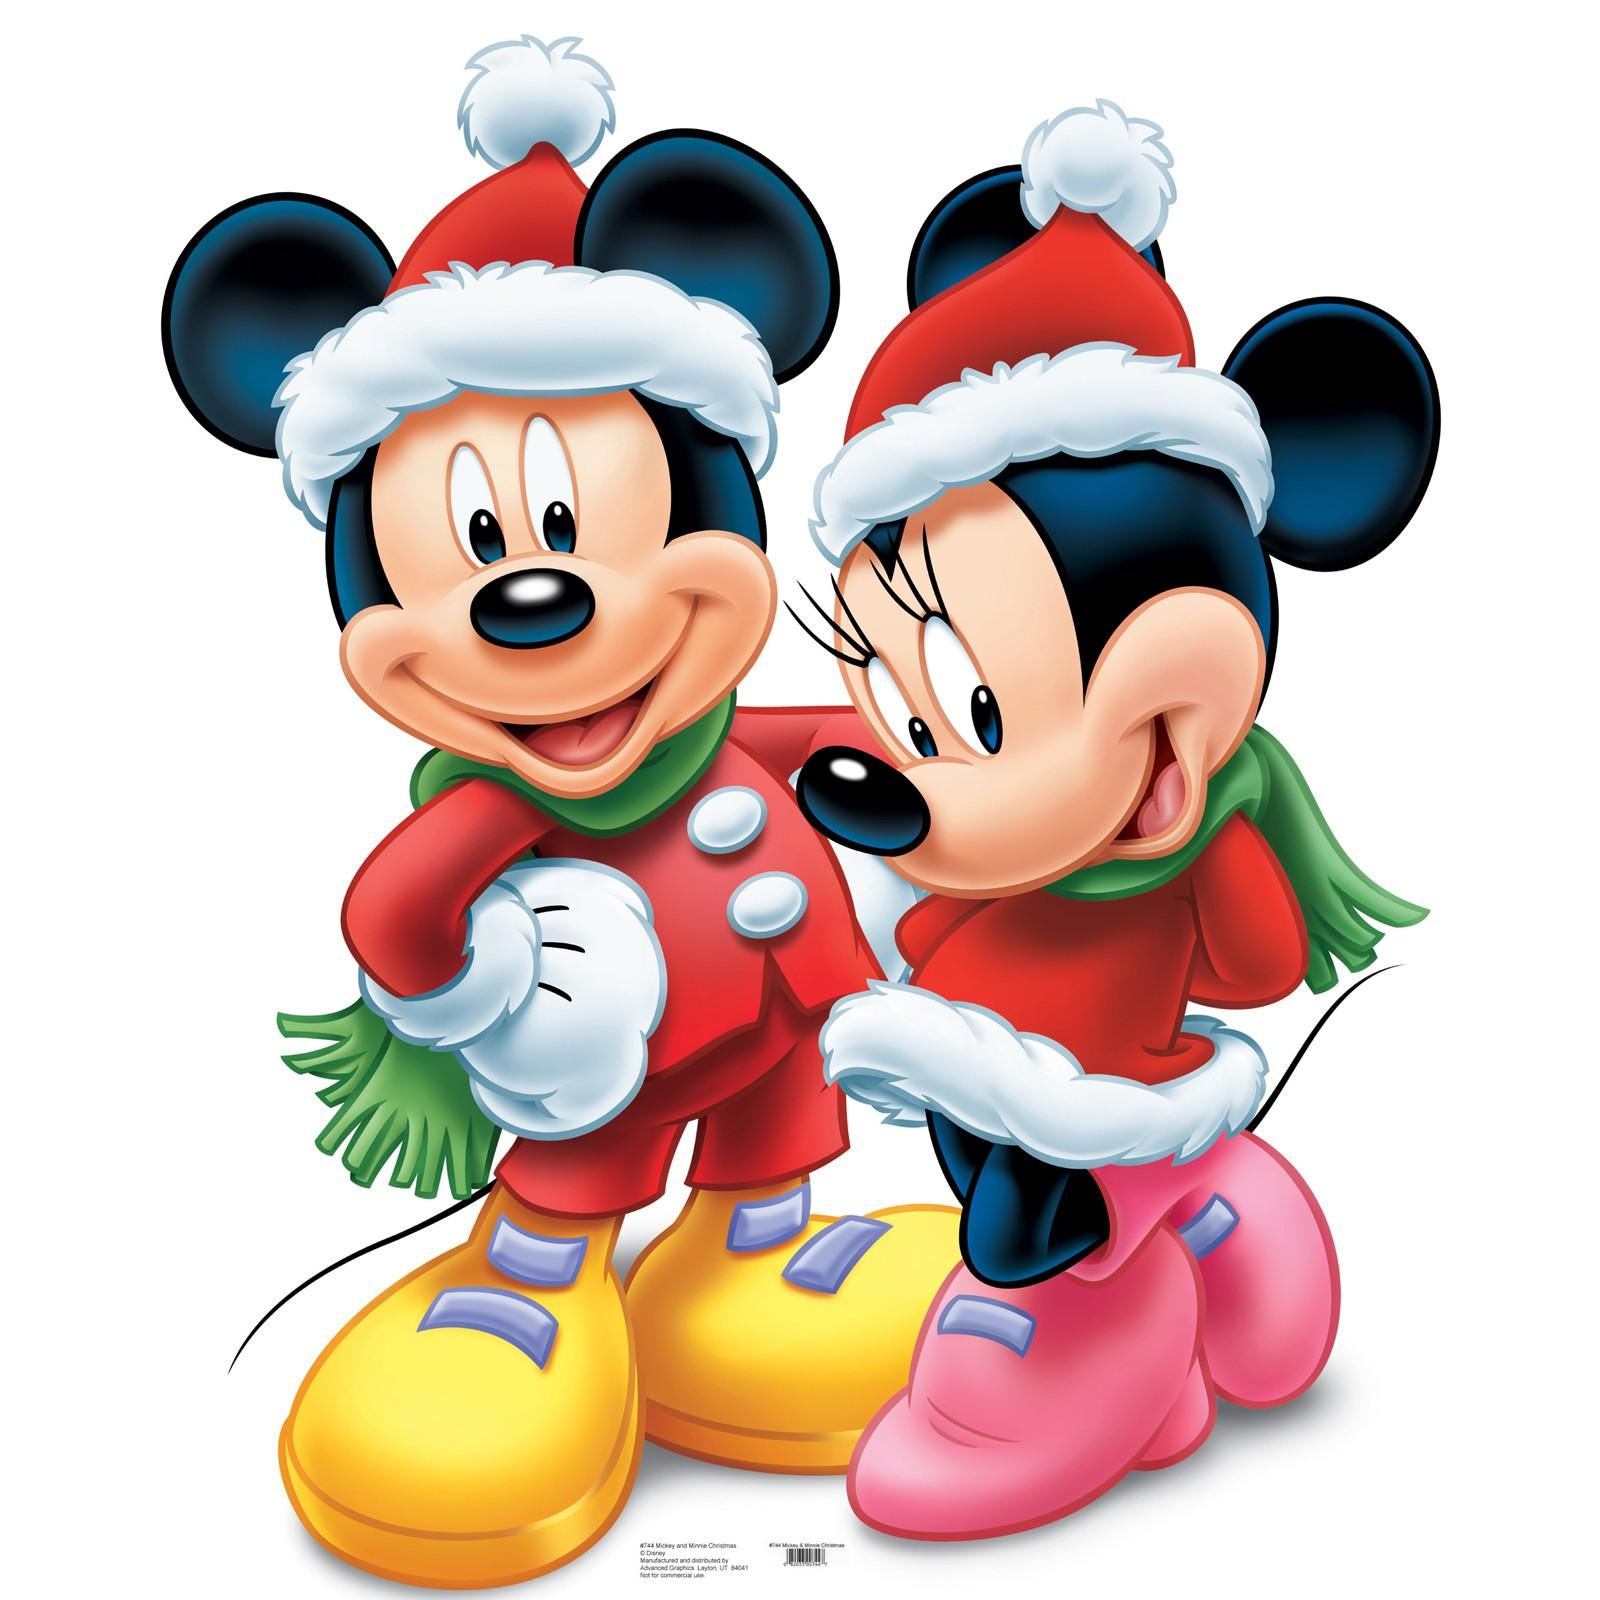 ���� �������. ������� ������ Disney, Hello Kitty, Ferrari, Cars, Me to You, Princess, Peppa, Dora �� 0 � ������. �������������� �����